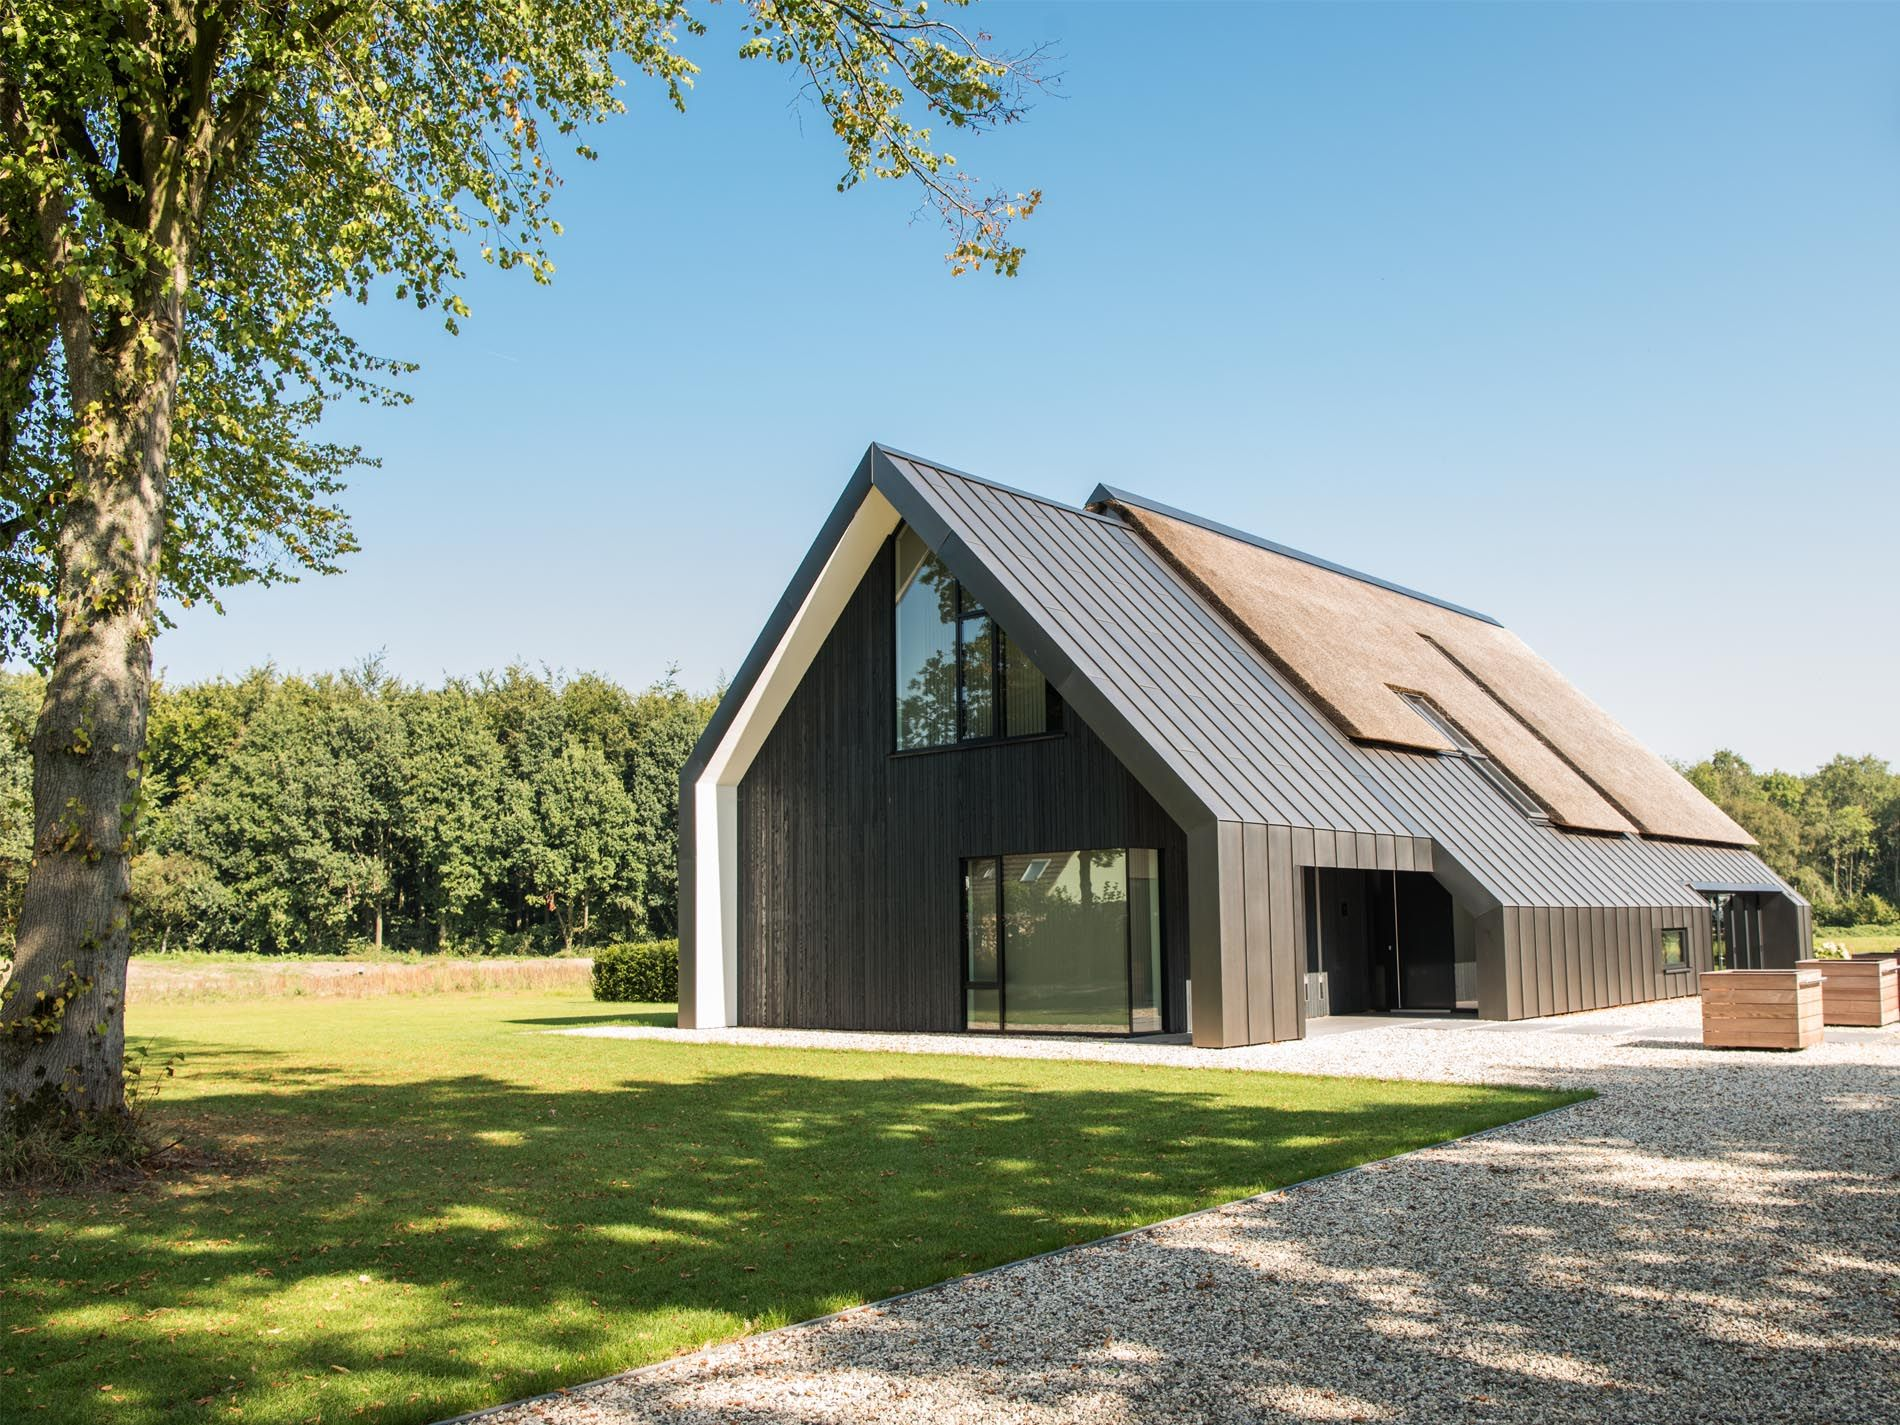 Maas architecten woonhuis peize riet zink titanium for Huizen architectuur